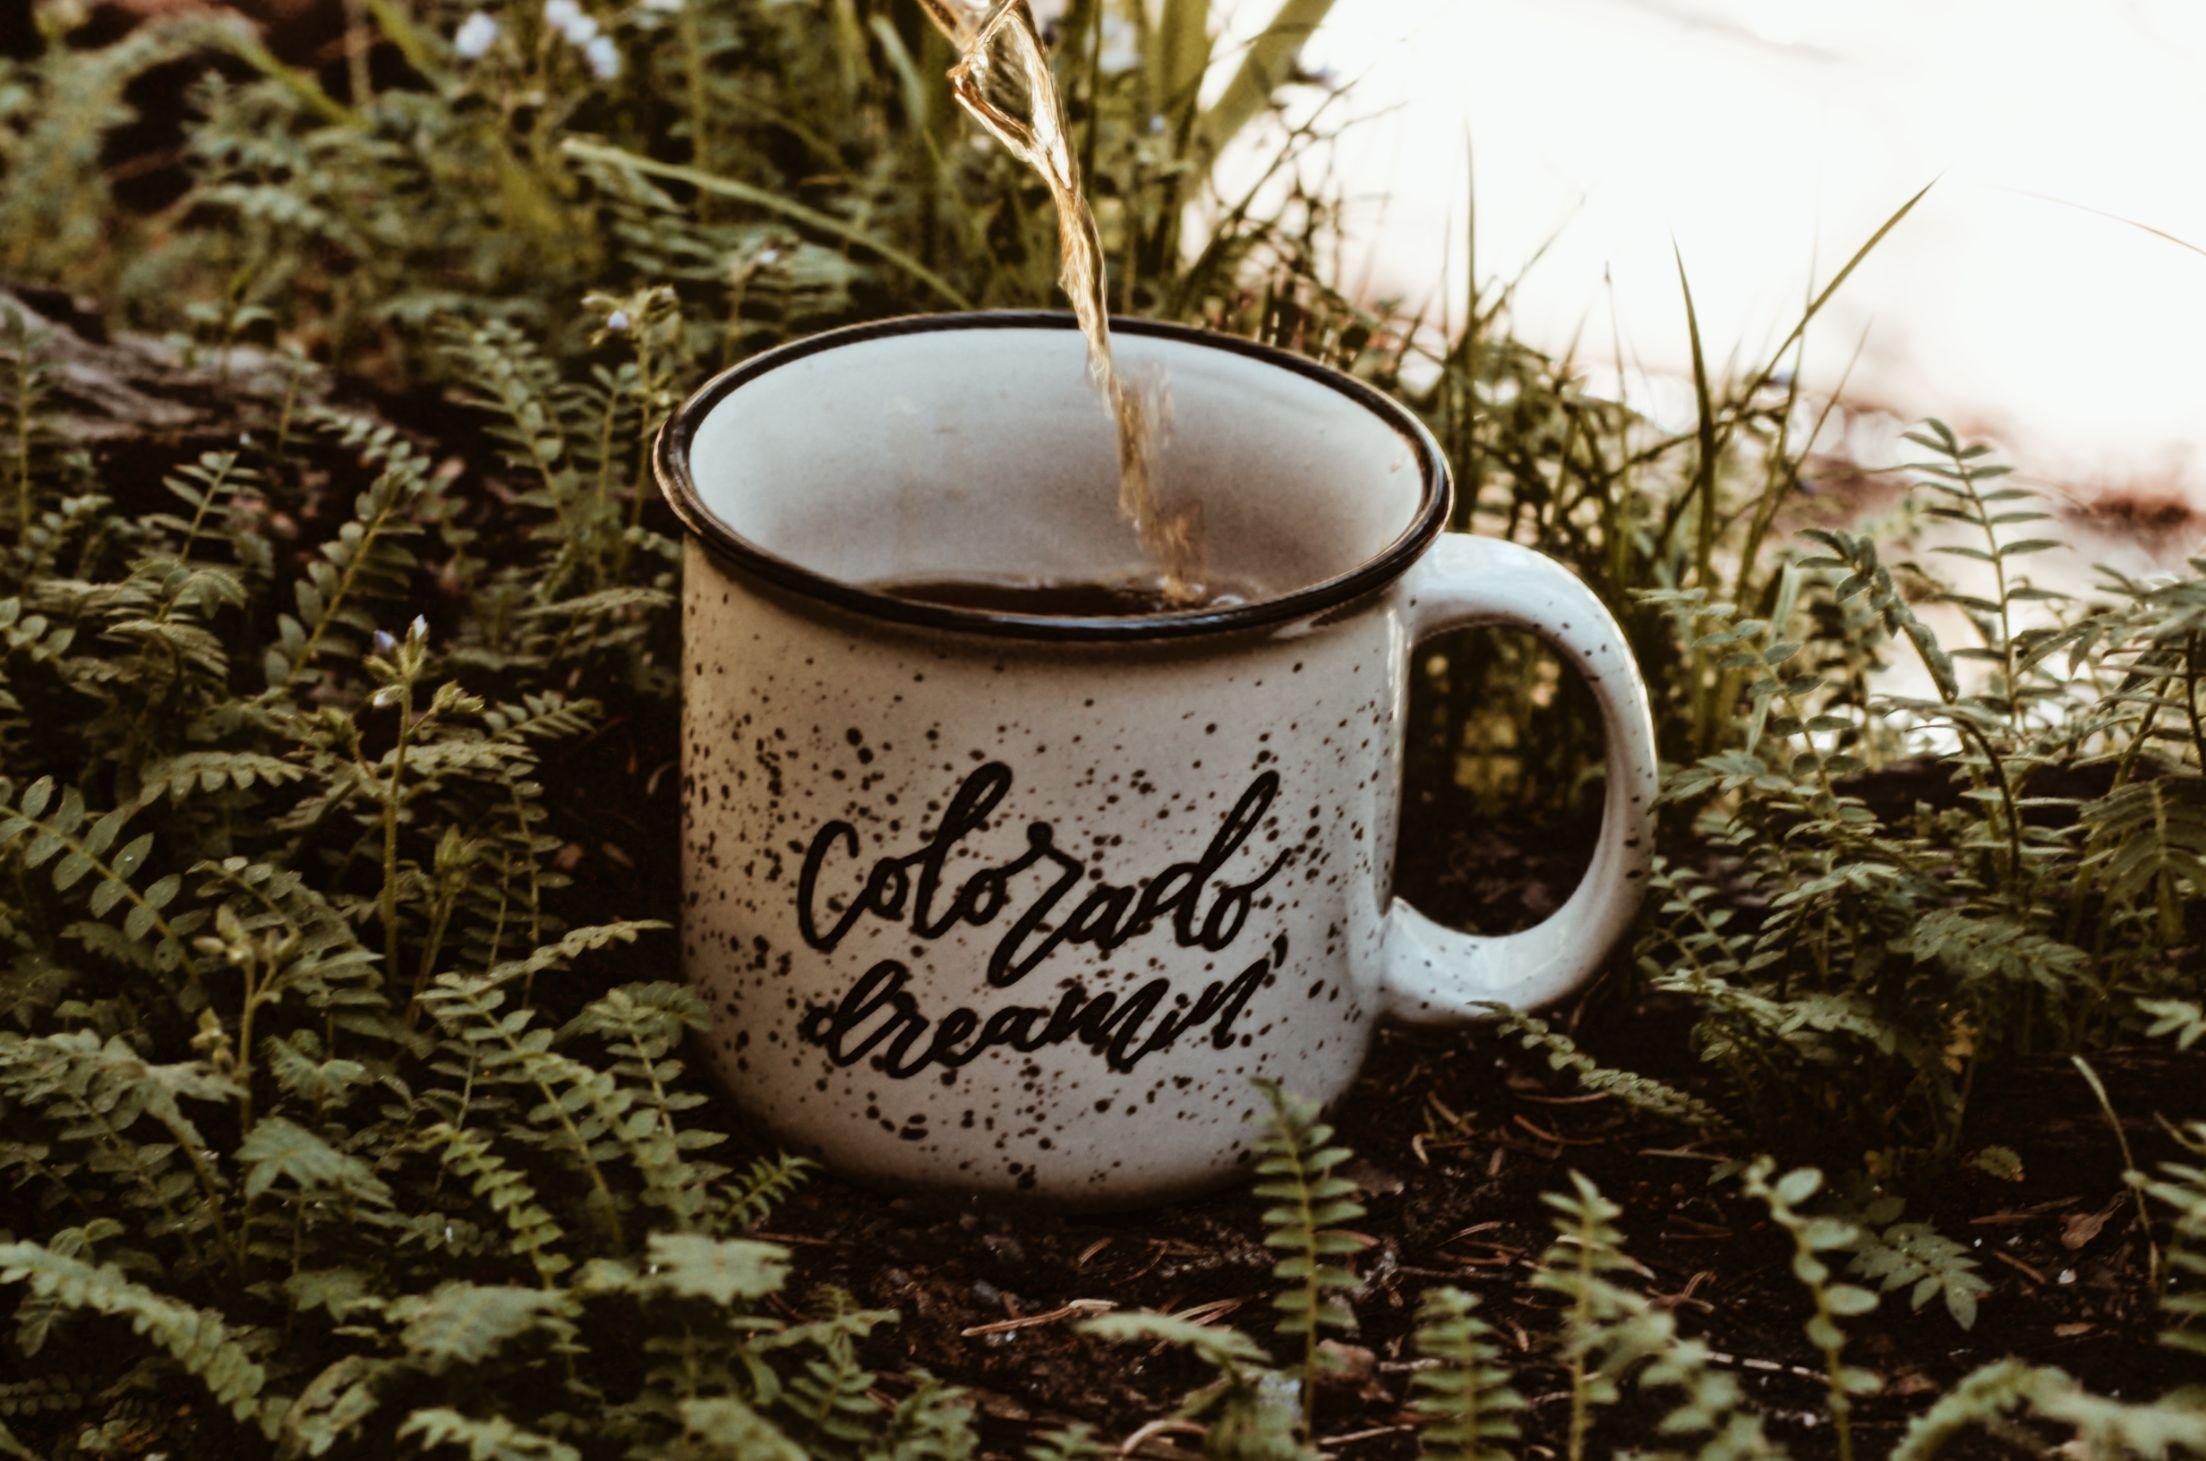 Colorado Dreamin' mug with coffee